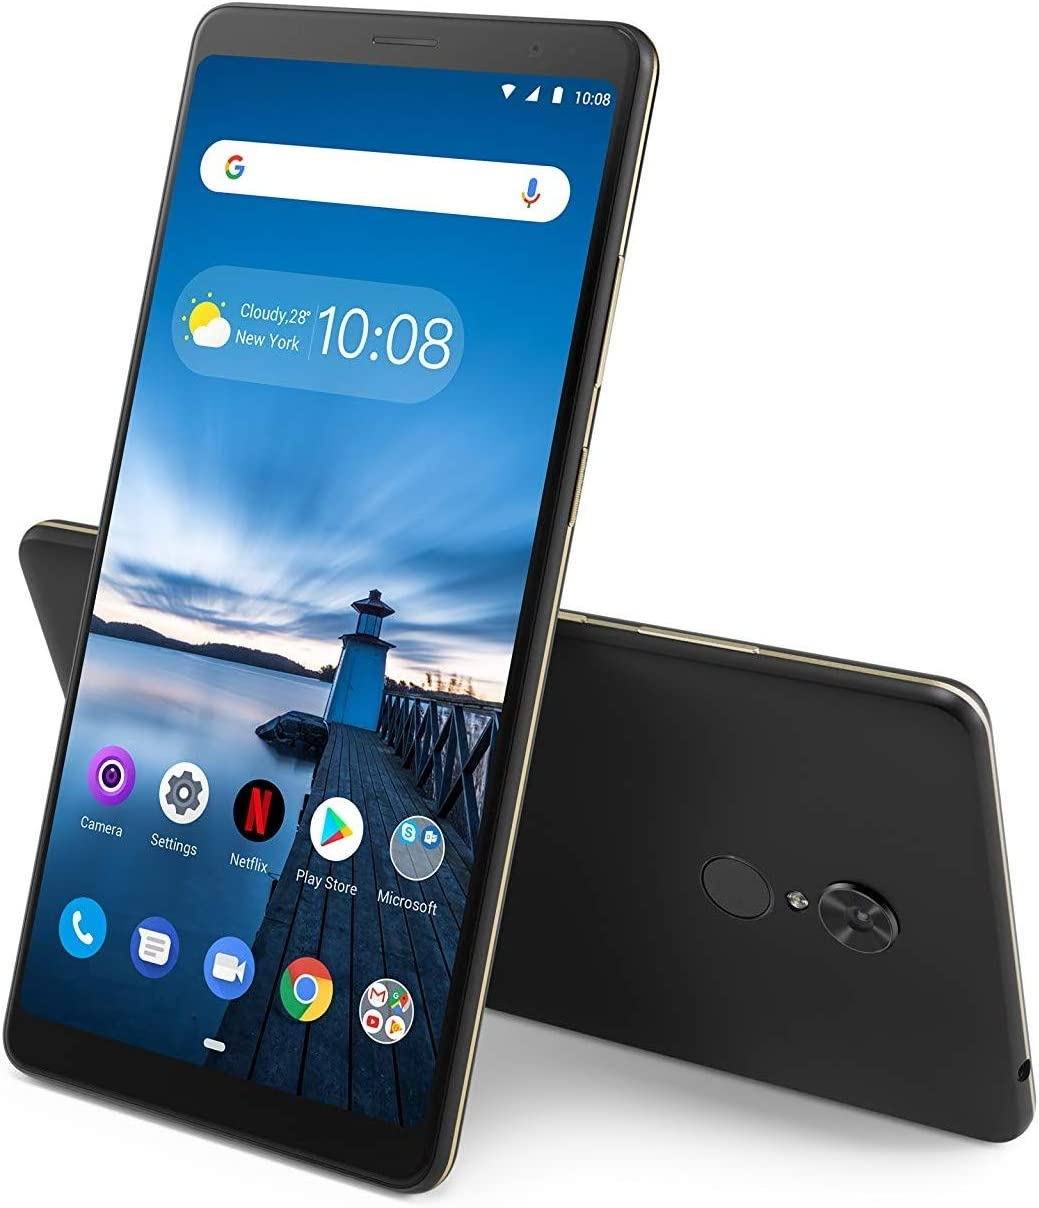 Lenovo Tab V7 Tablet (6.9 inch, 32GB, Wi-Fi + 4G Voice Calling)